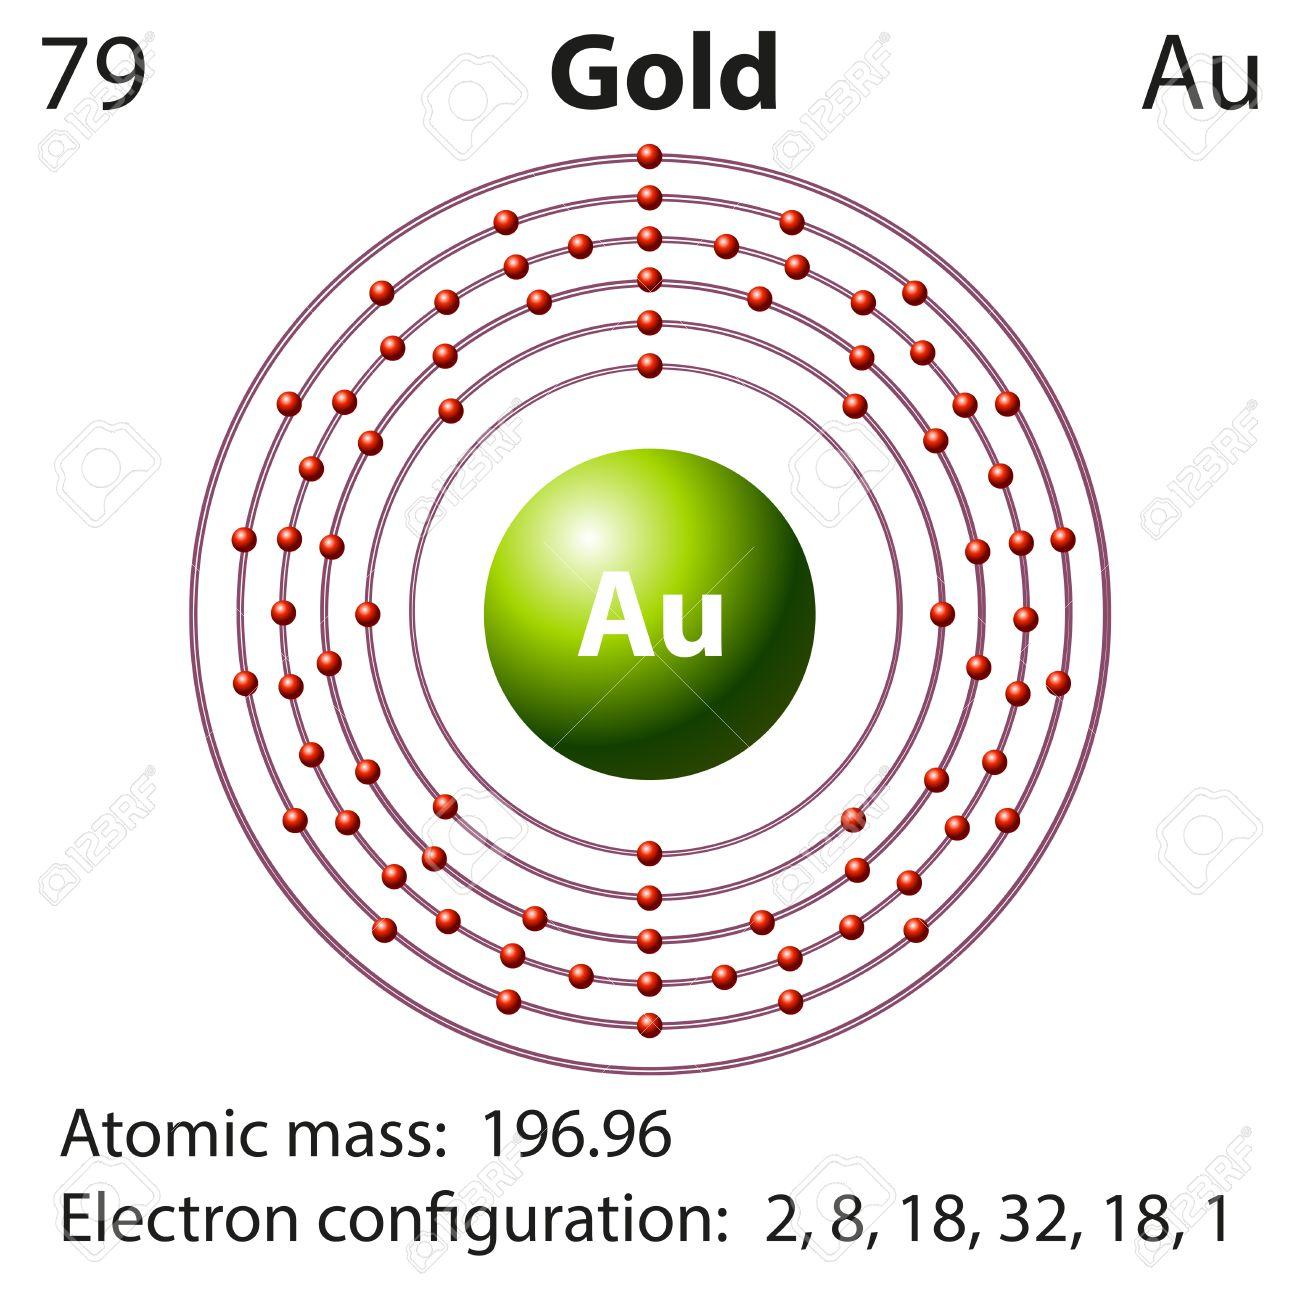 diagram representation of the element gold illustration stock vector -  44789075